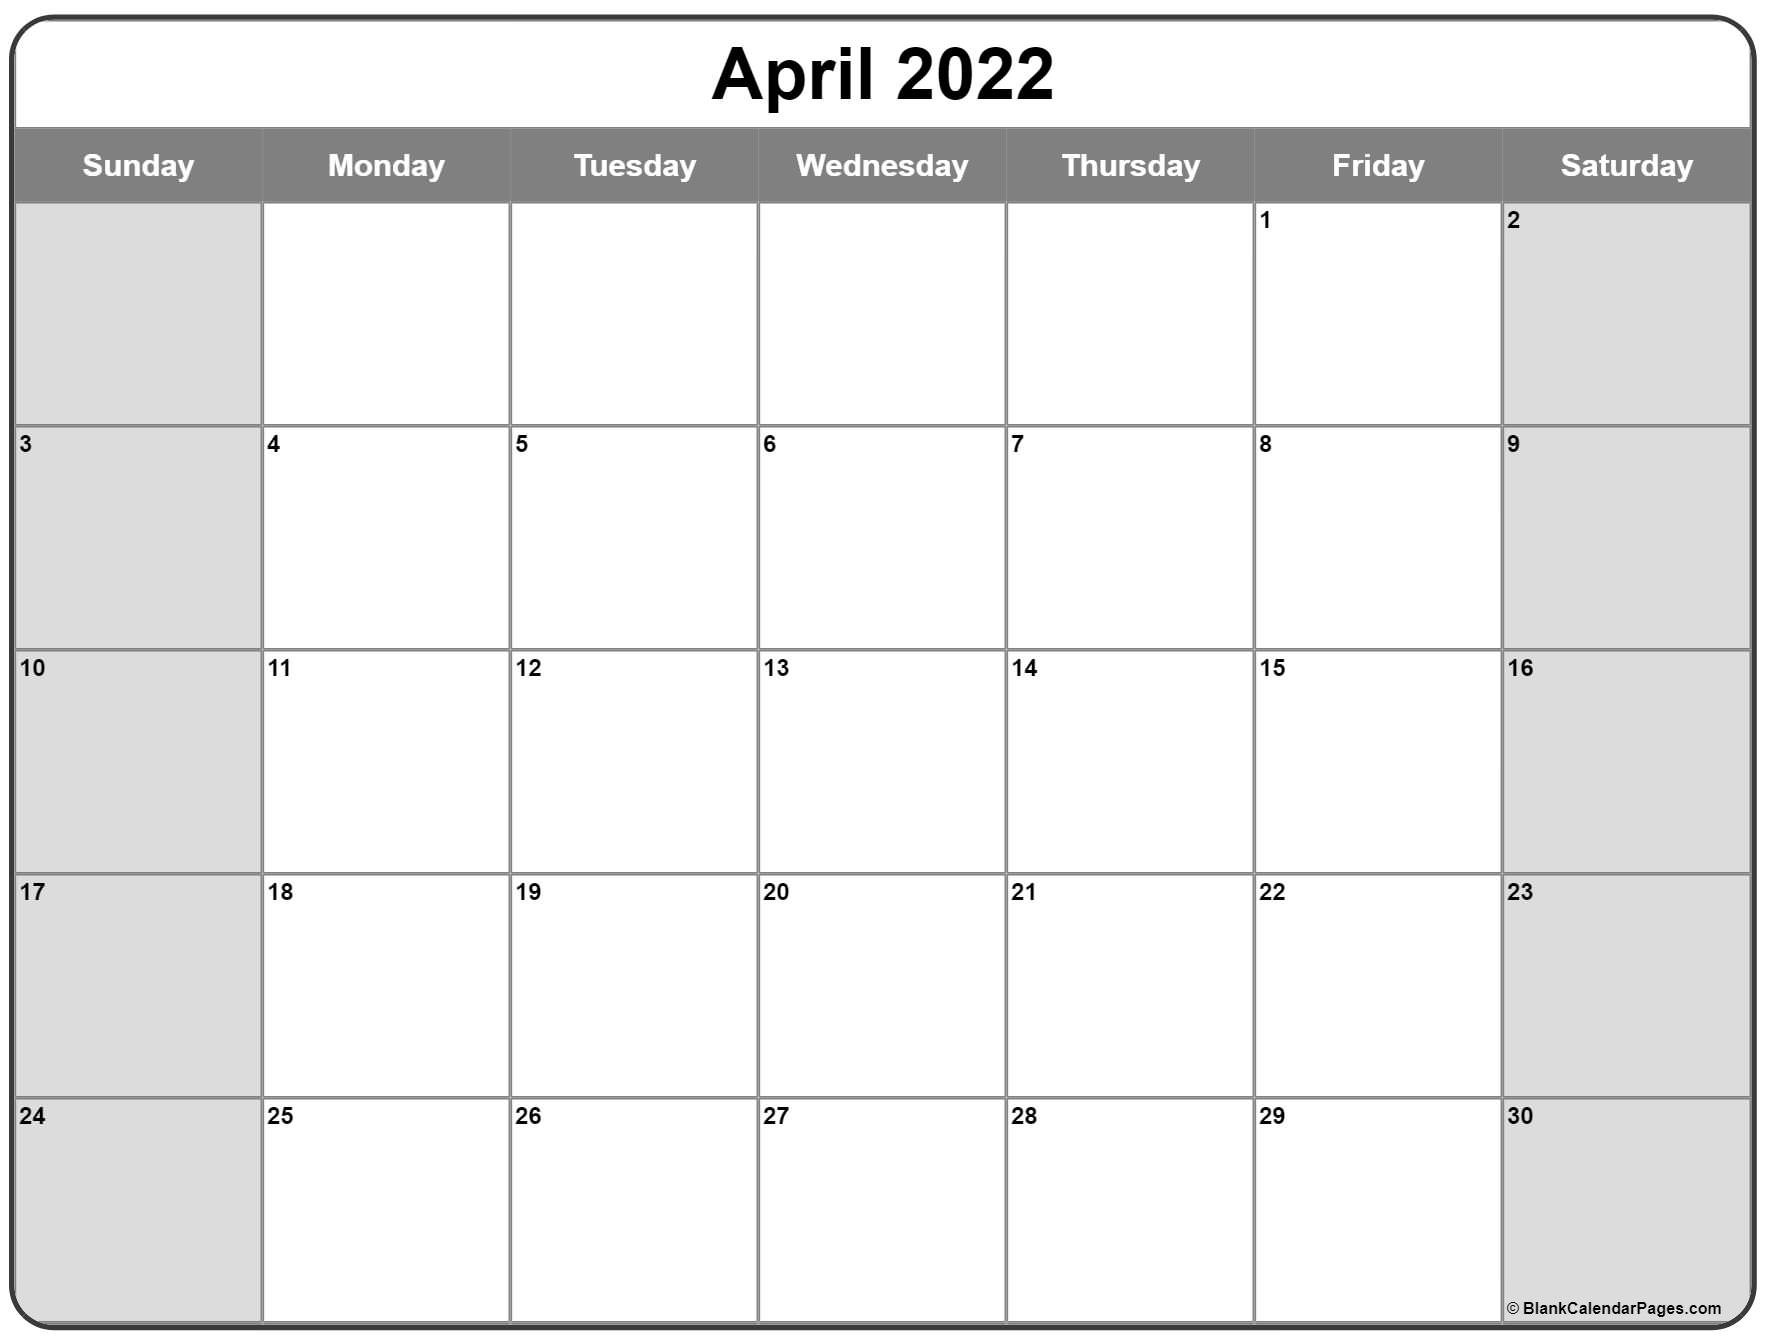 April 2022 Calendar | Free Printable Calendar Templates with 2022 April Calendar Free Printable Graphics